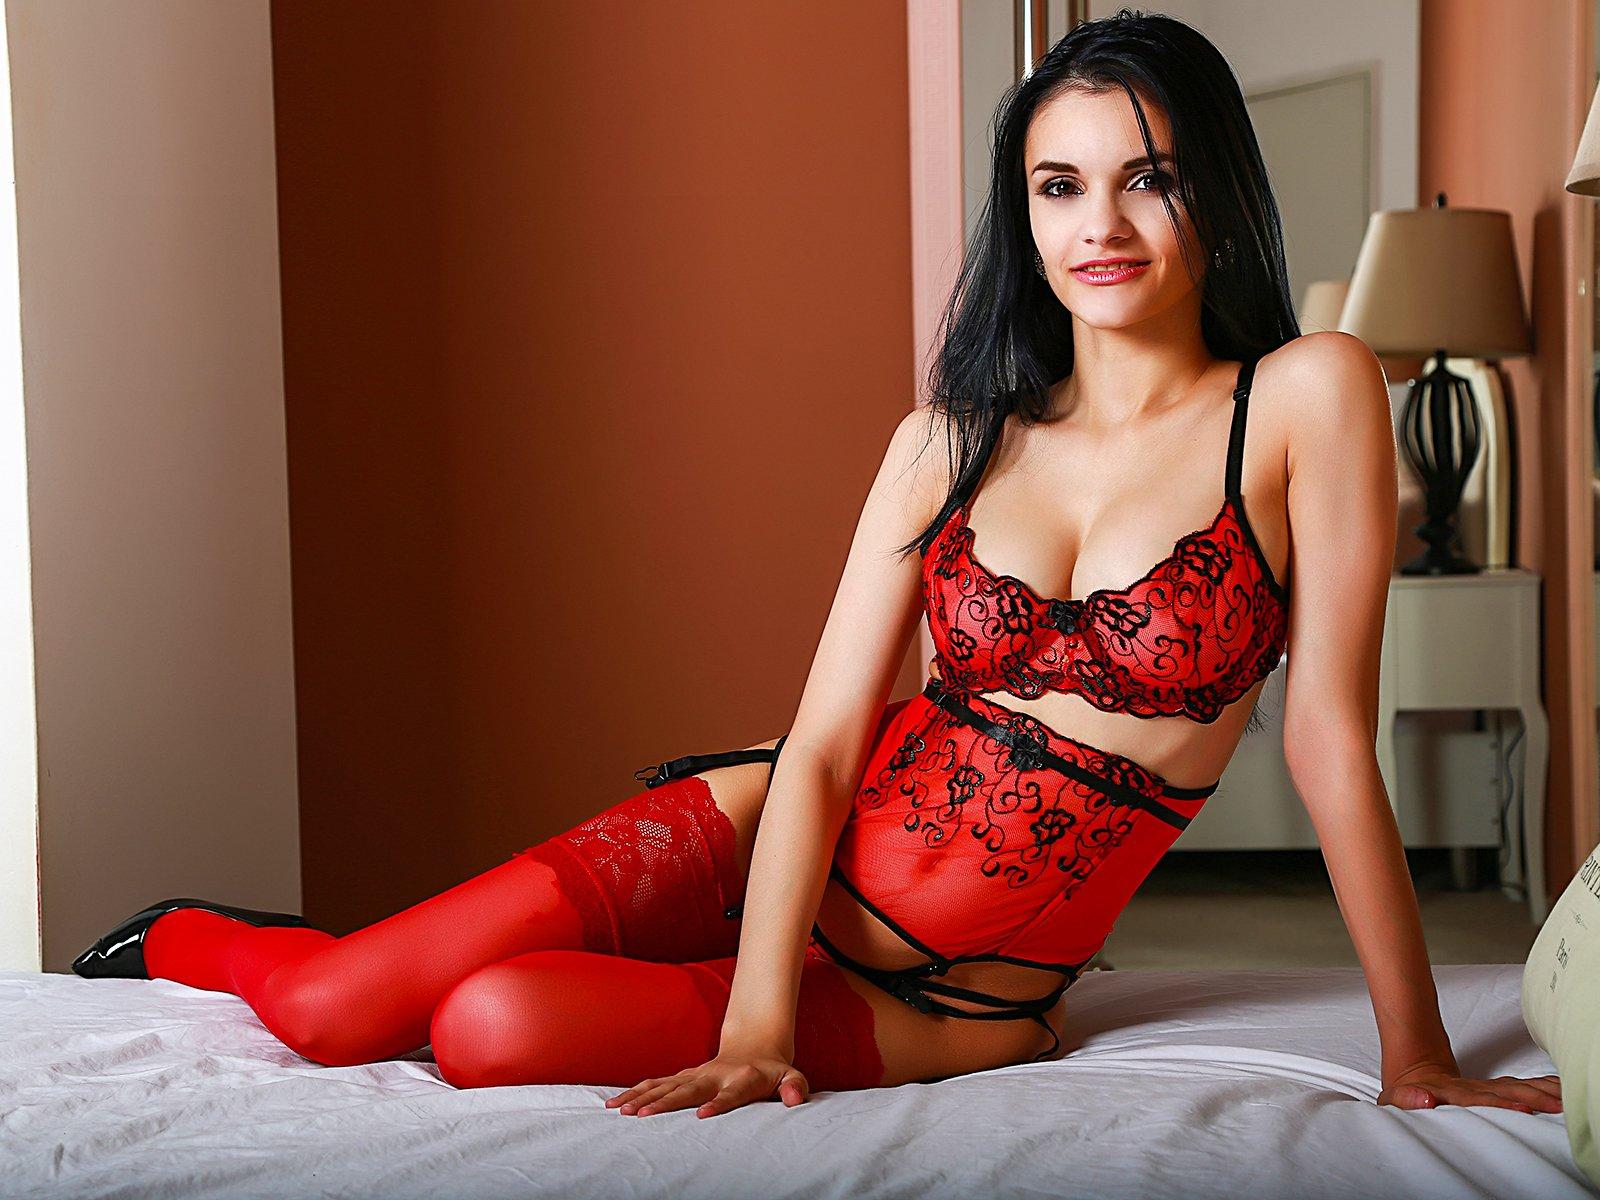 Alizze Sex cutiealizee - females 18-34 - 20 years old